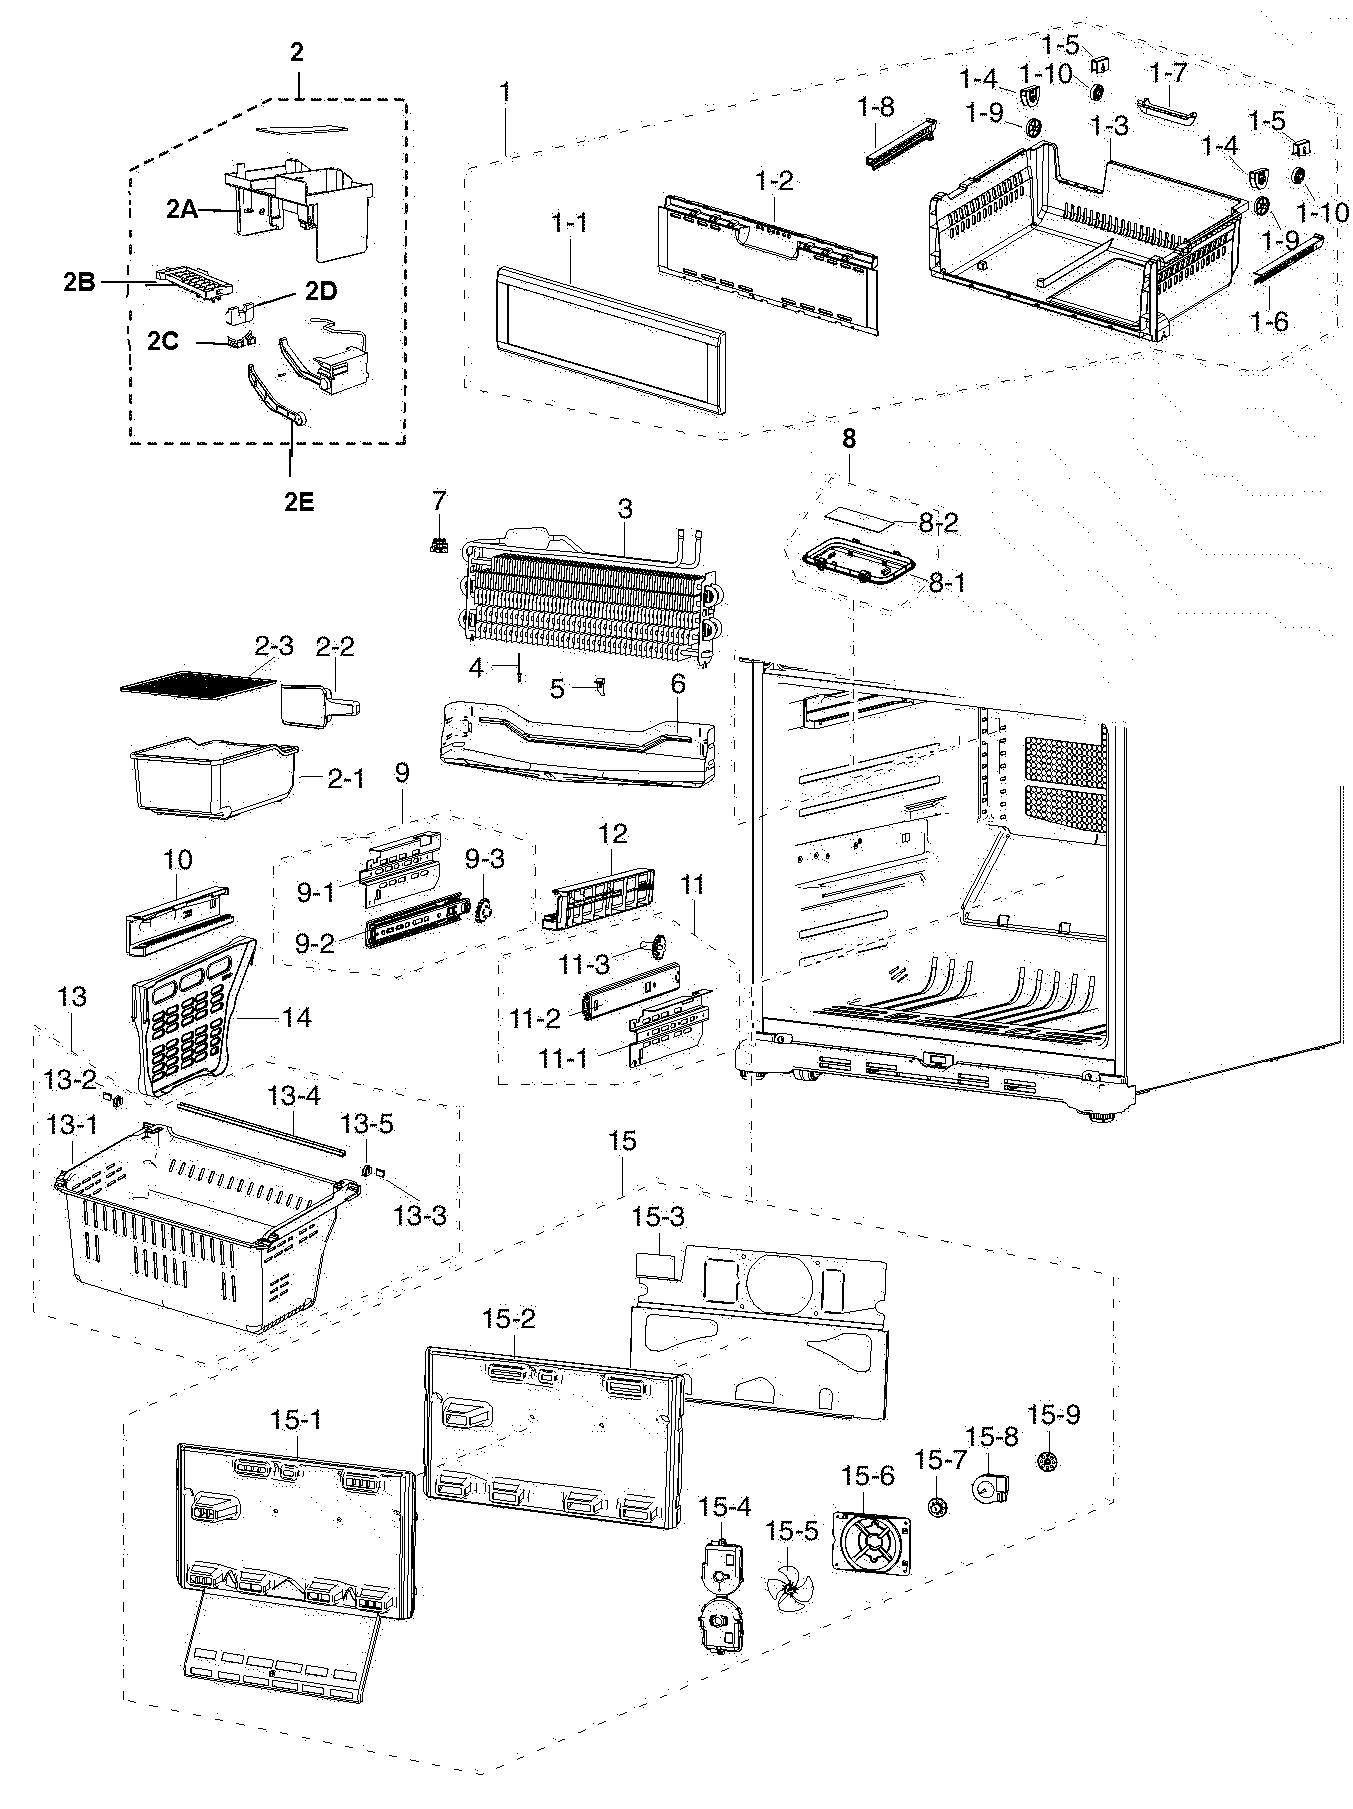 Samsung model RF217ACRS/XAA-00 bottom-mount refrigerator